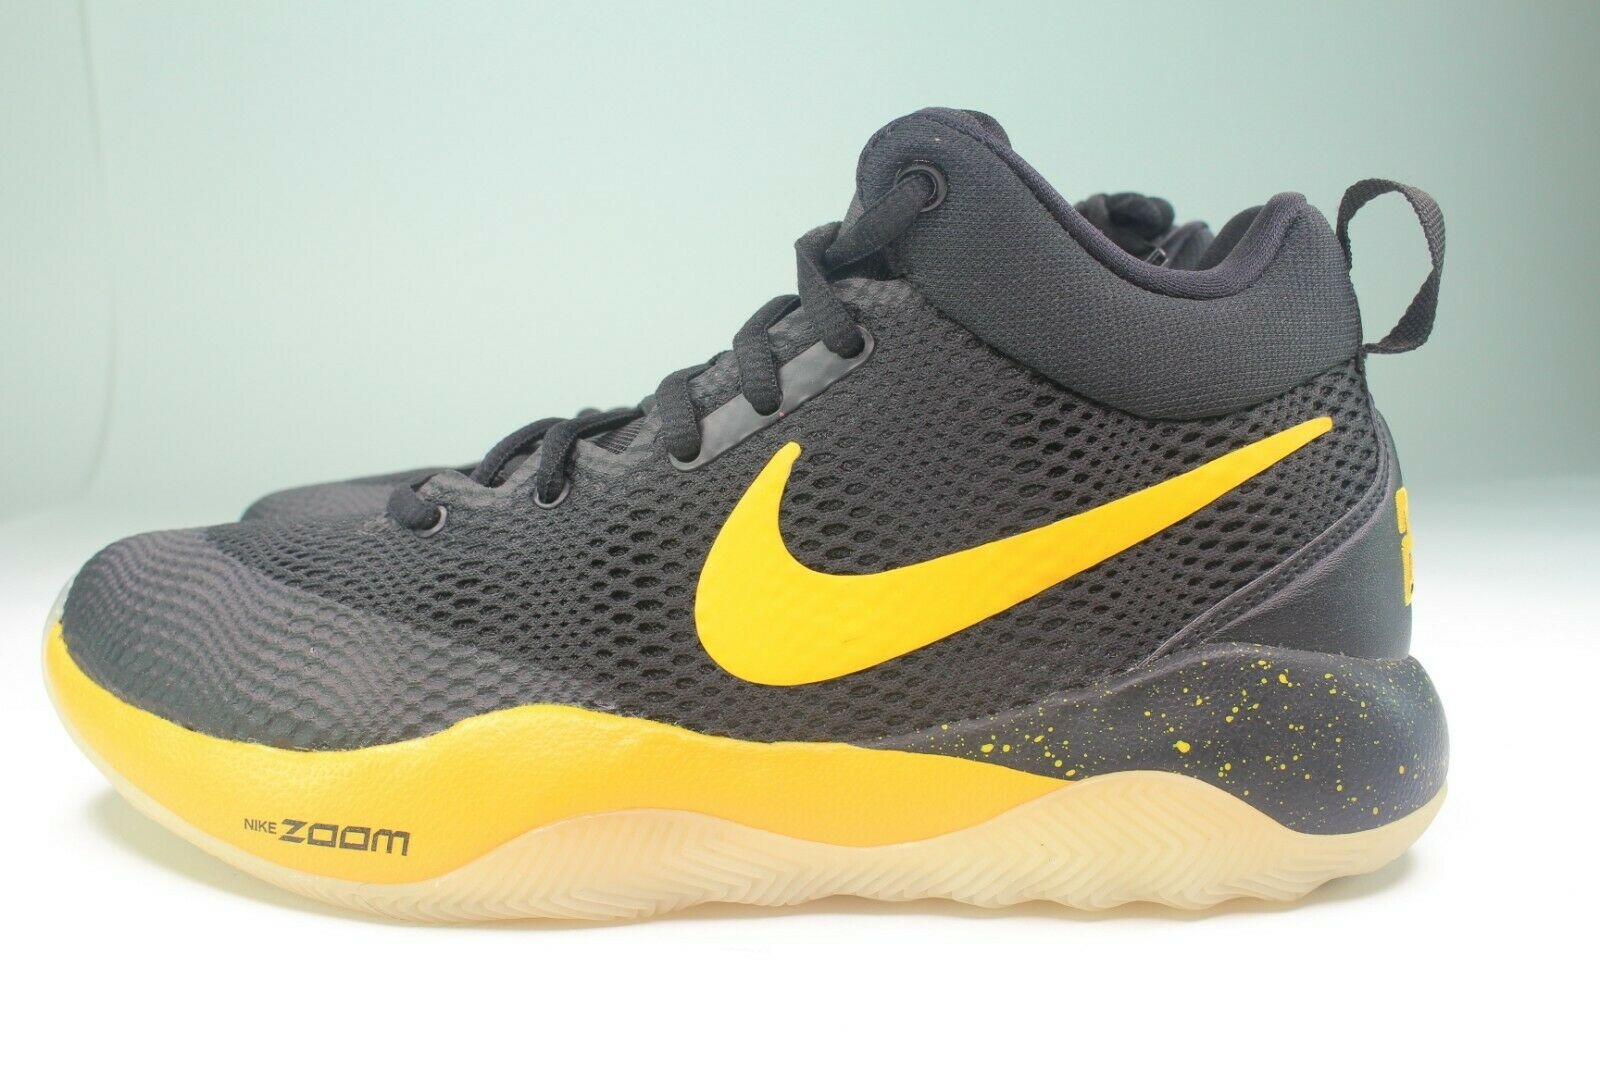 Nike Zoom Rev Pe Herren Größe 8.0 Schwarz University Gold Basketball 910572 070